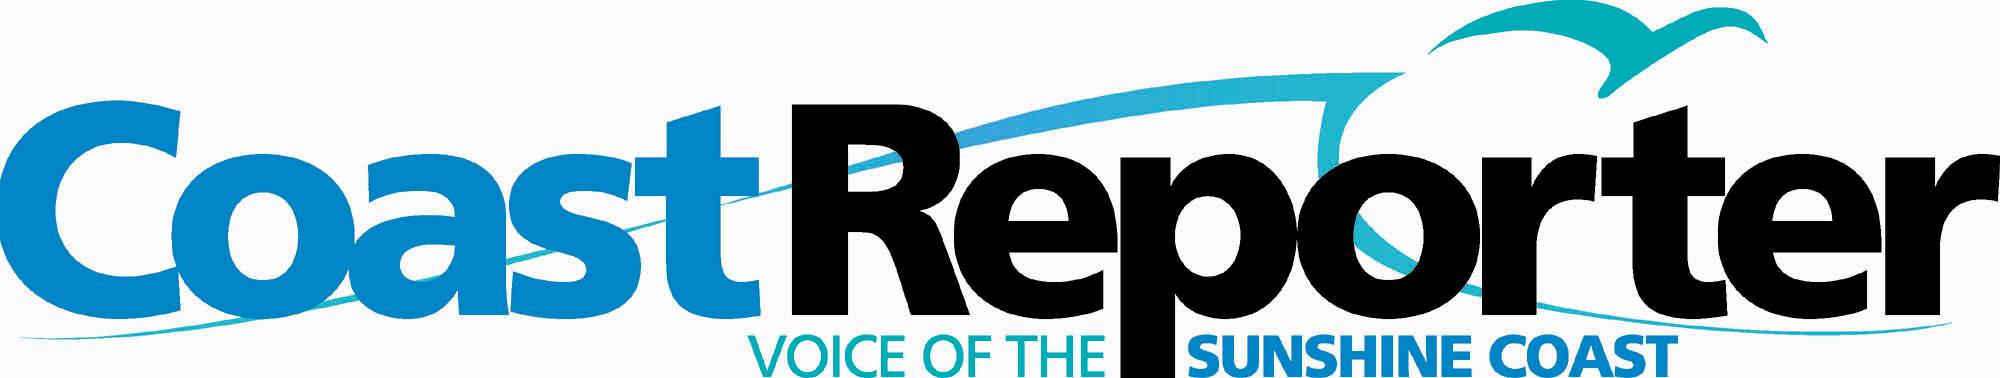 coastreporter-logo